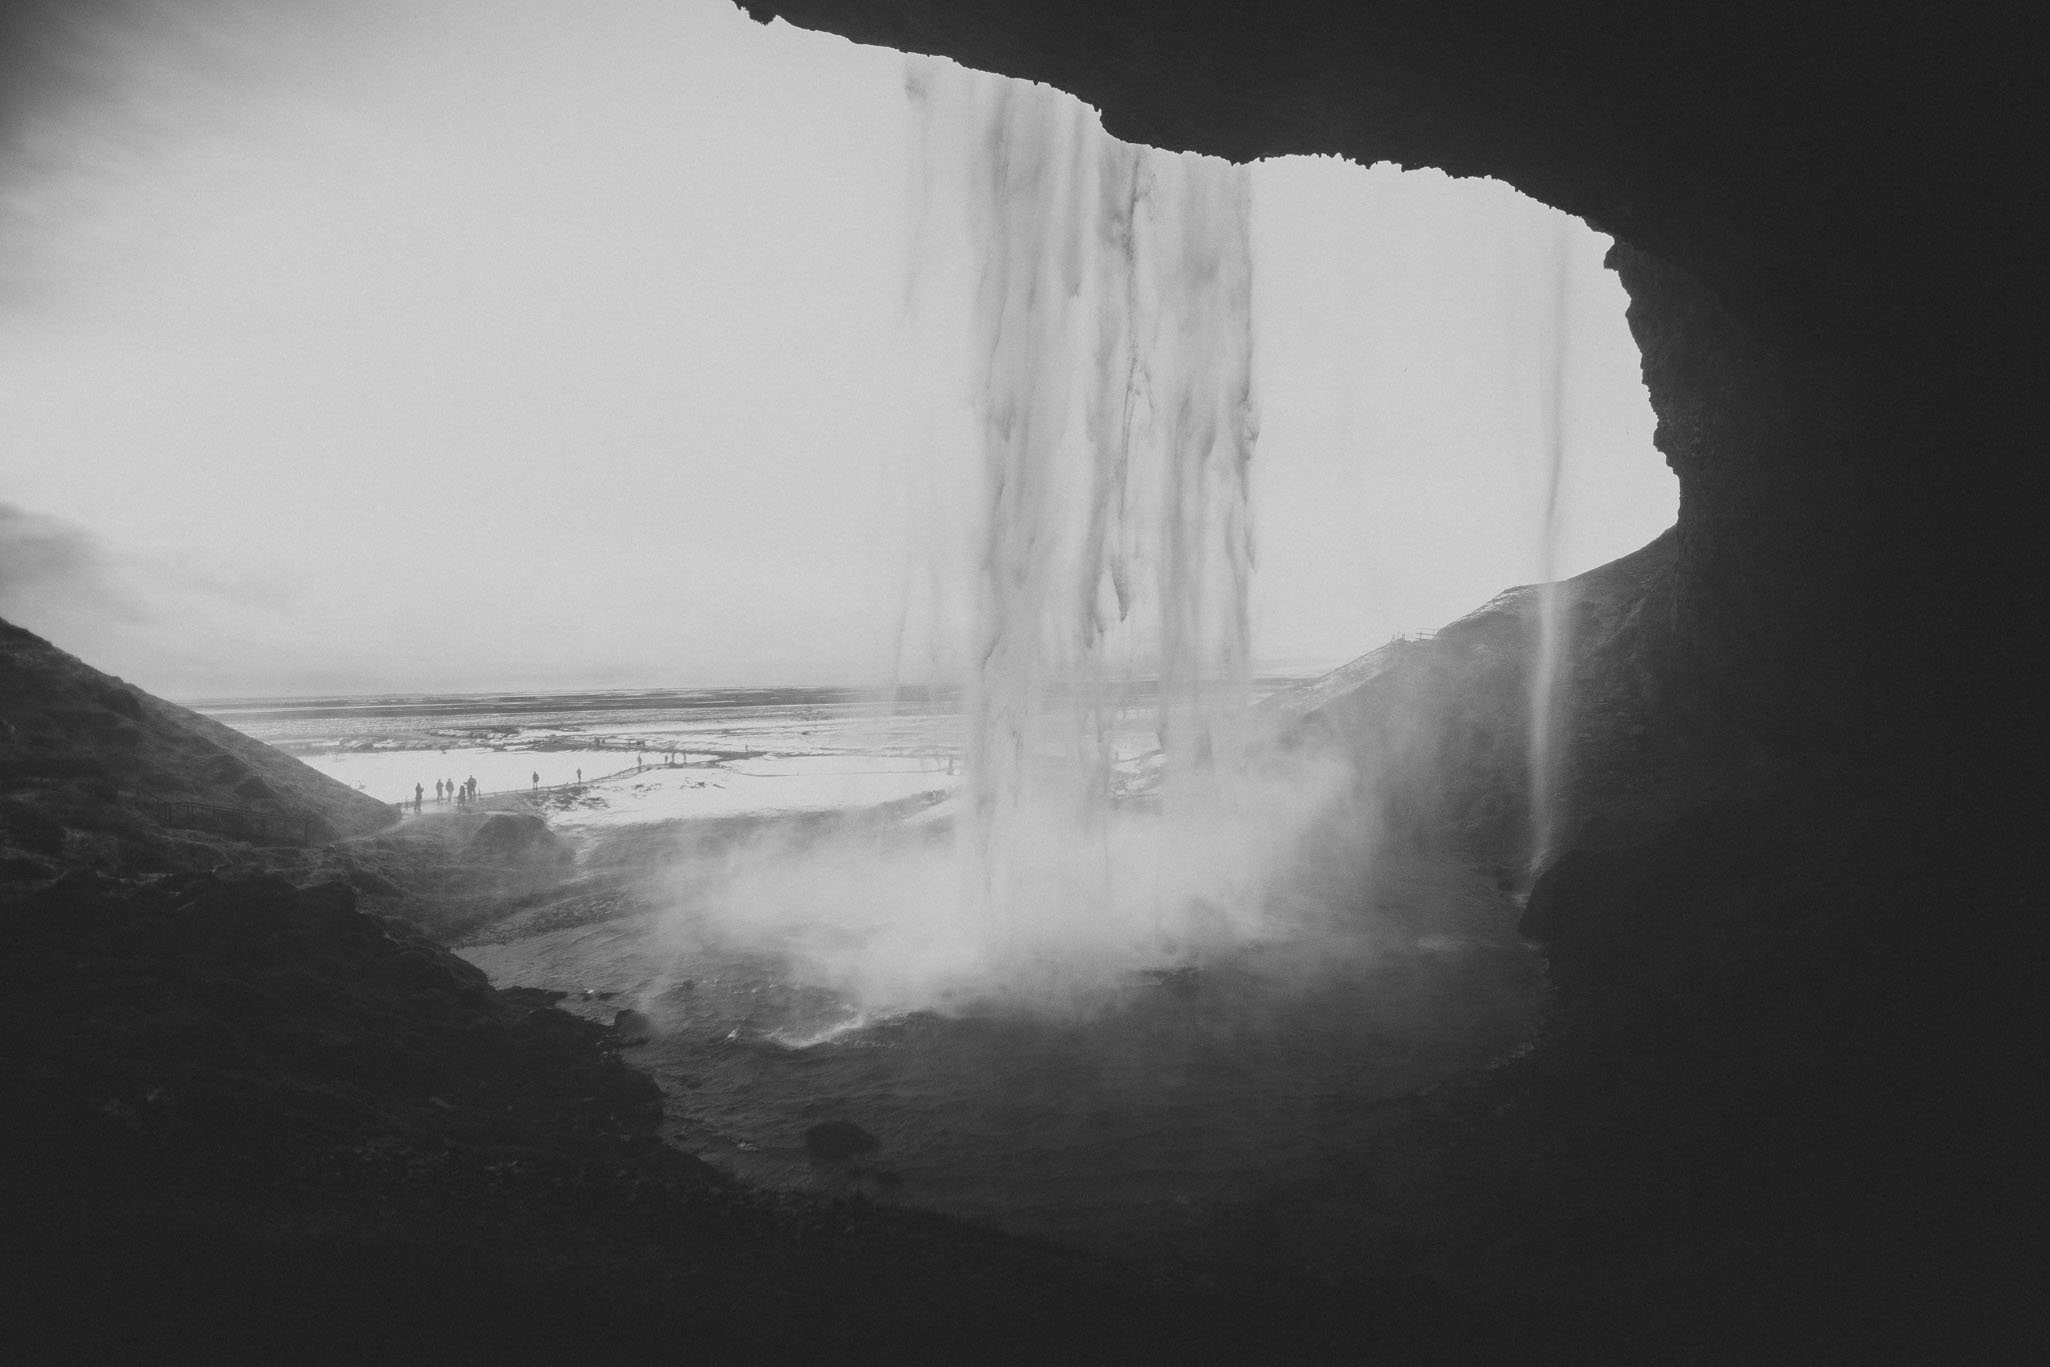 Road-trip-Islande-Iceland-Voyage-Travel-Portrait-Jérémy-Boyer-Cascade-waterfall-foss-Seljalandsfoss-9.jpg